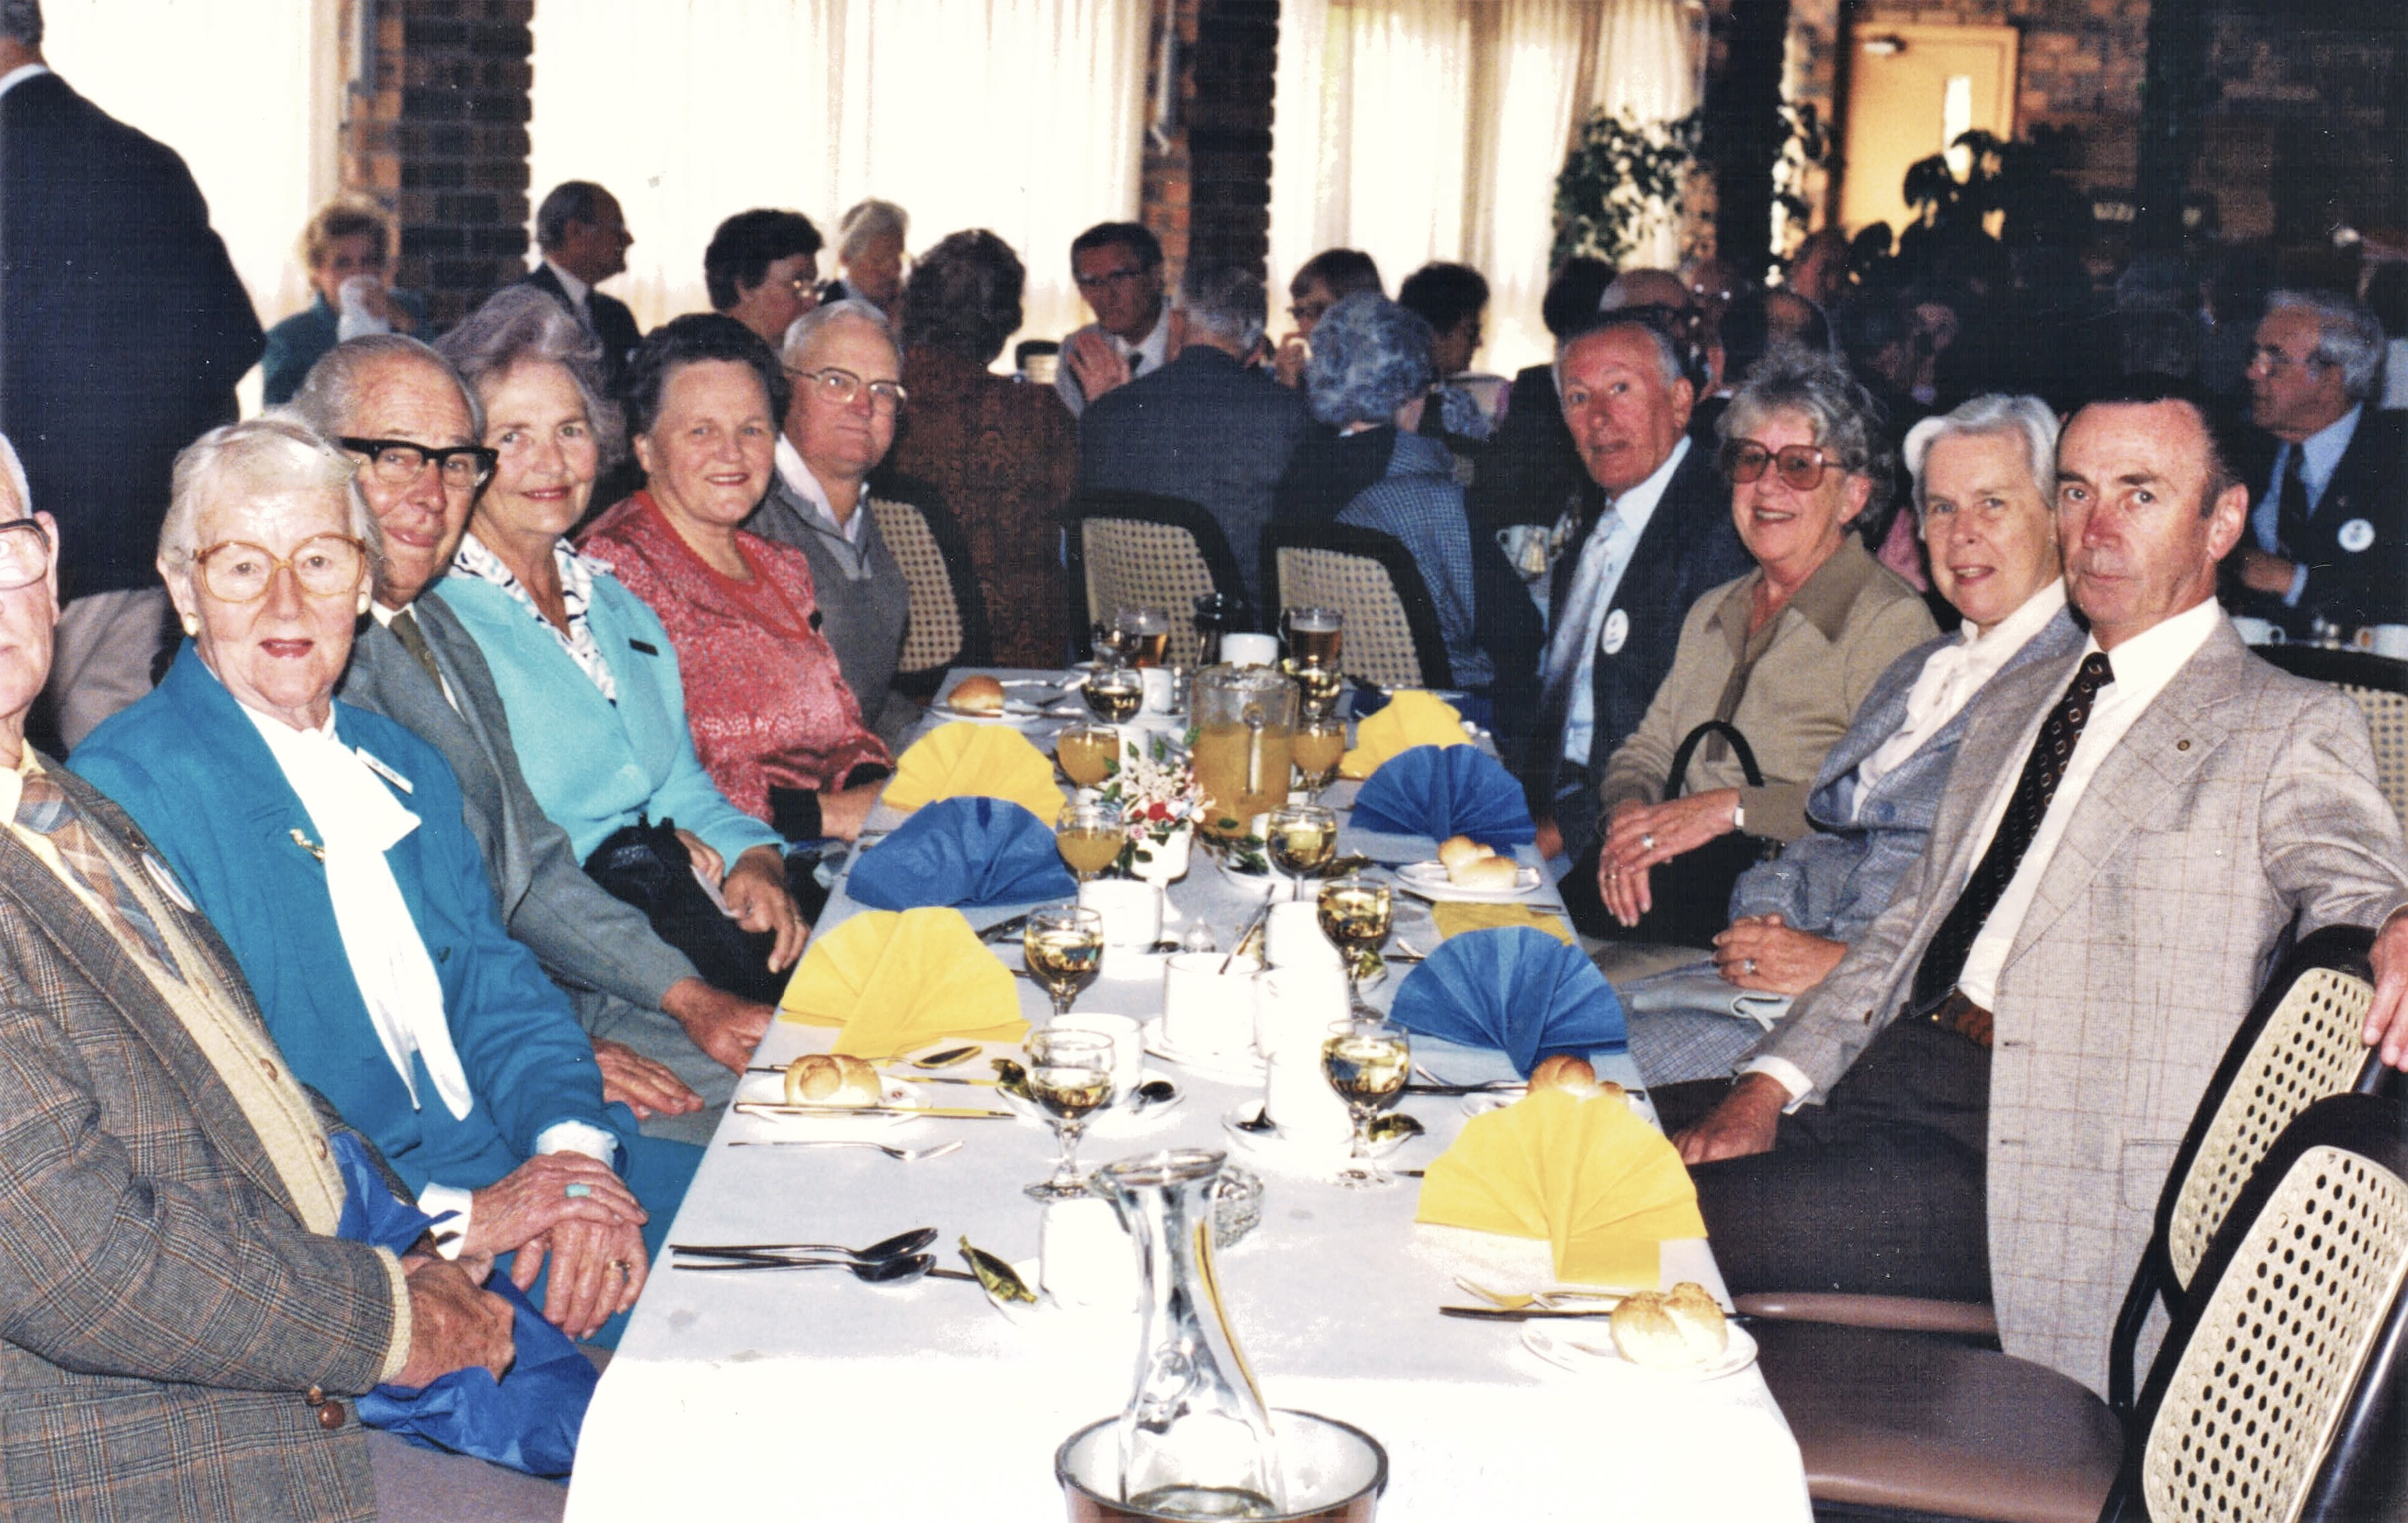 1989 Activities Annual Luncheon 11-7-89.